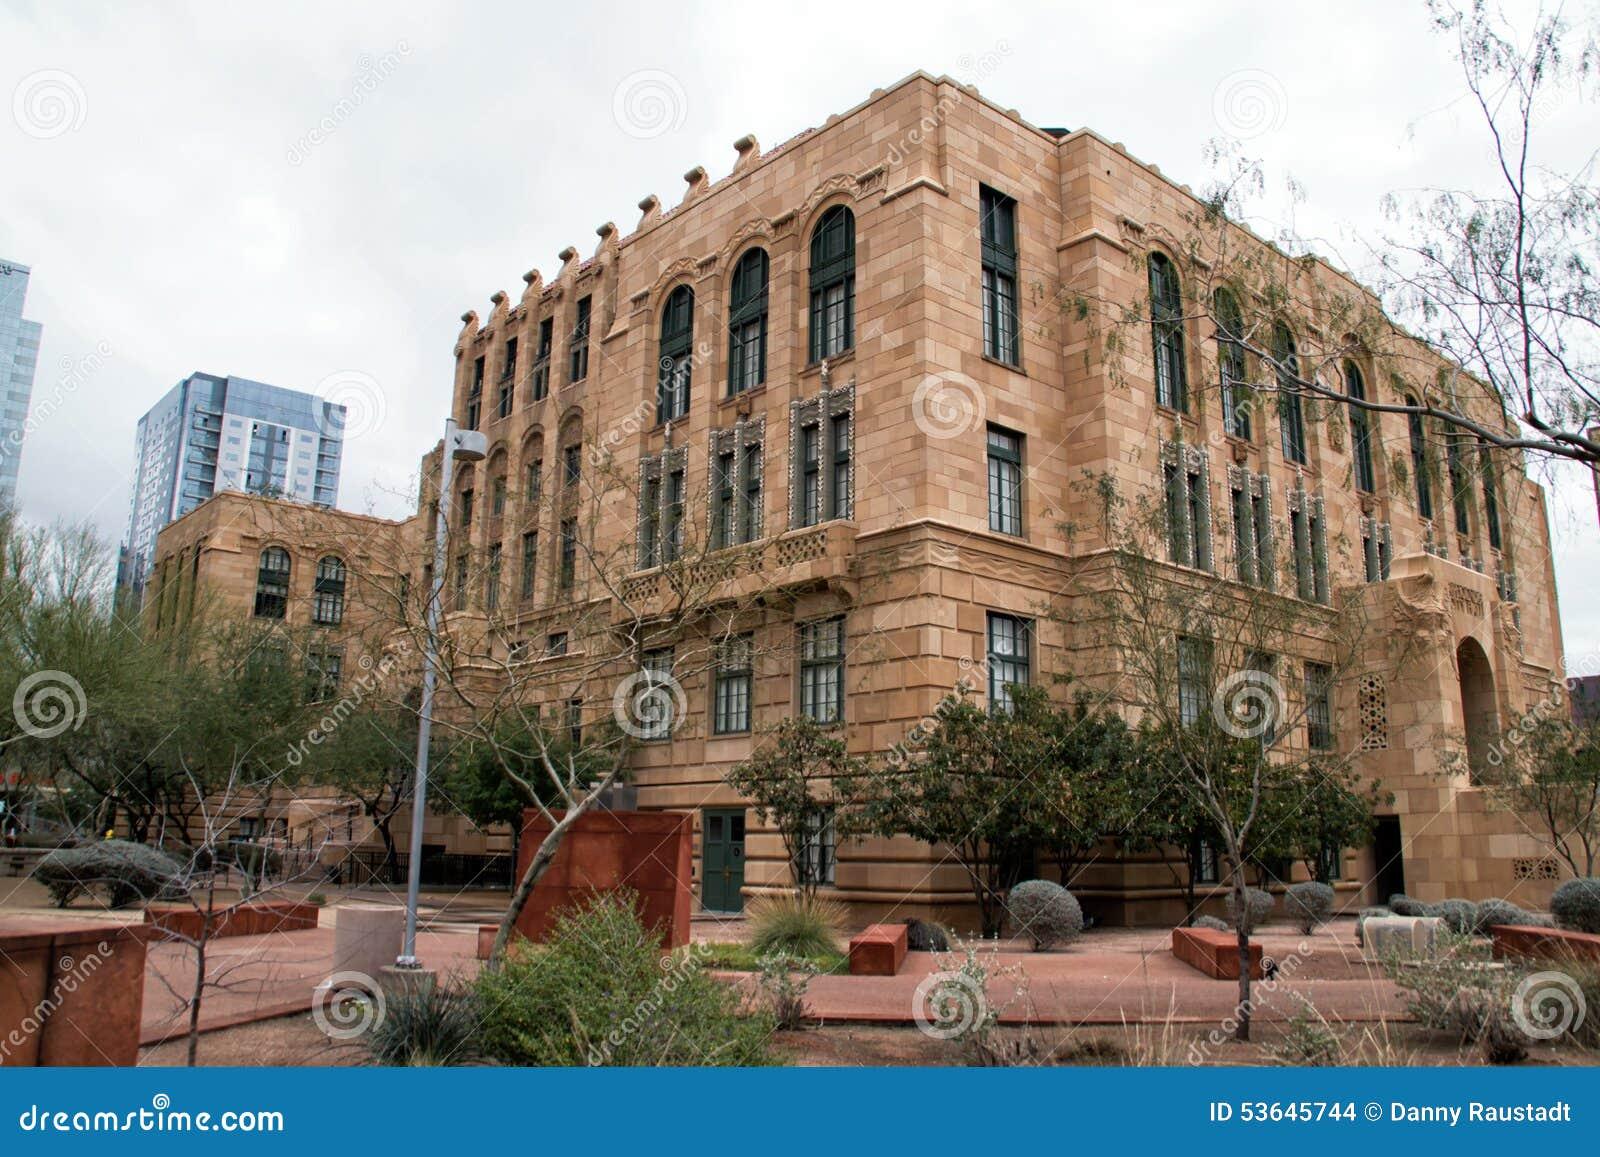 Historic maricopa county courthouse in phoenix arizona for Classic house phoenix